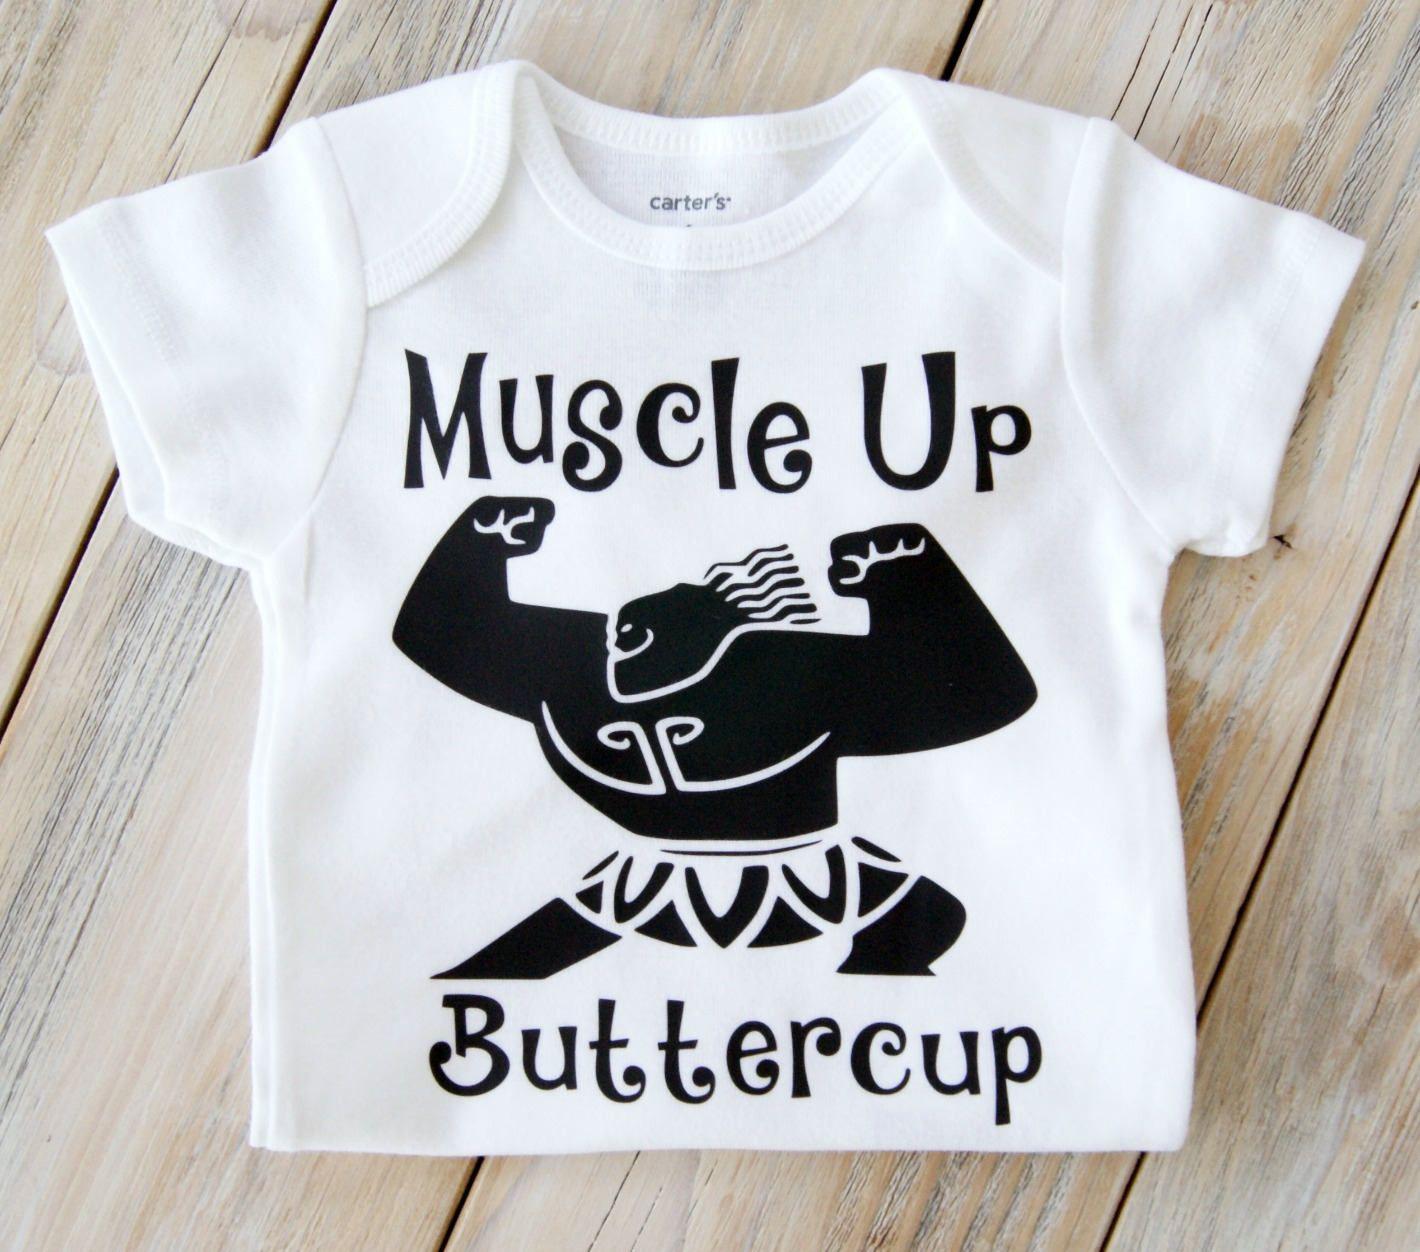 8e28a2e59 Muscle Up Buttercup-Maui Demi God Onesie-Moana-Disney-Baby Girl Onesie-Boy  Onesie-Custom Onesie-Baby Girl Clothing- Moana - Maui - Toddler by ...